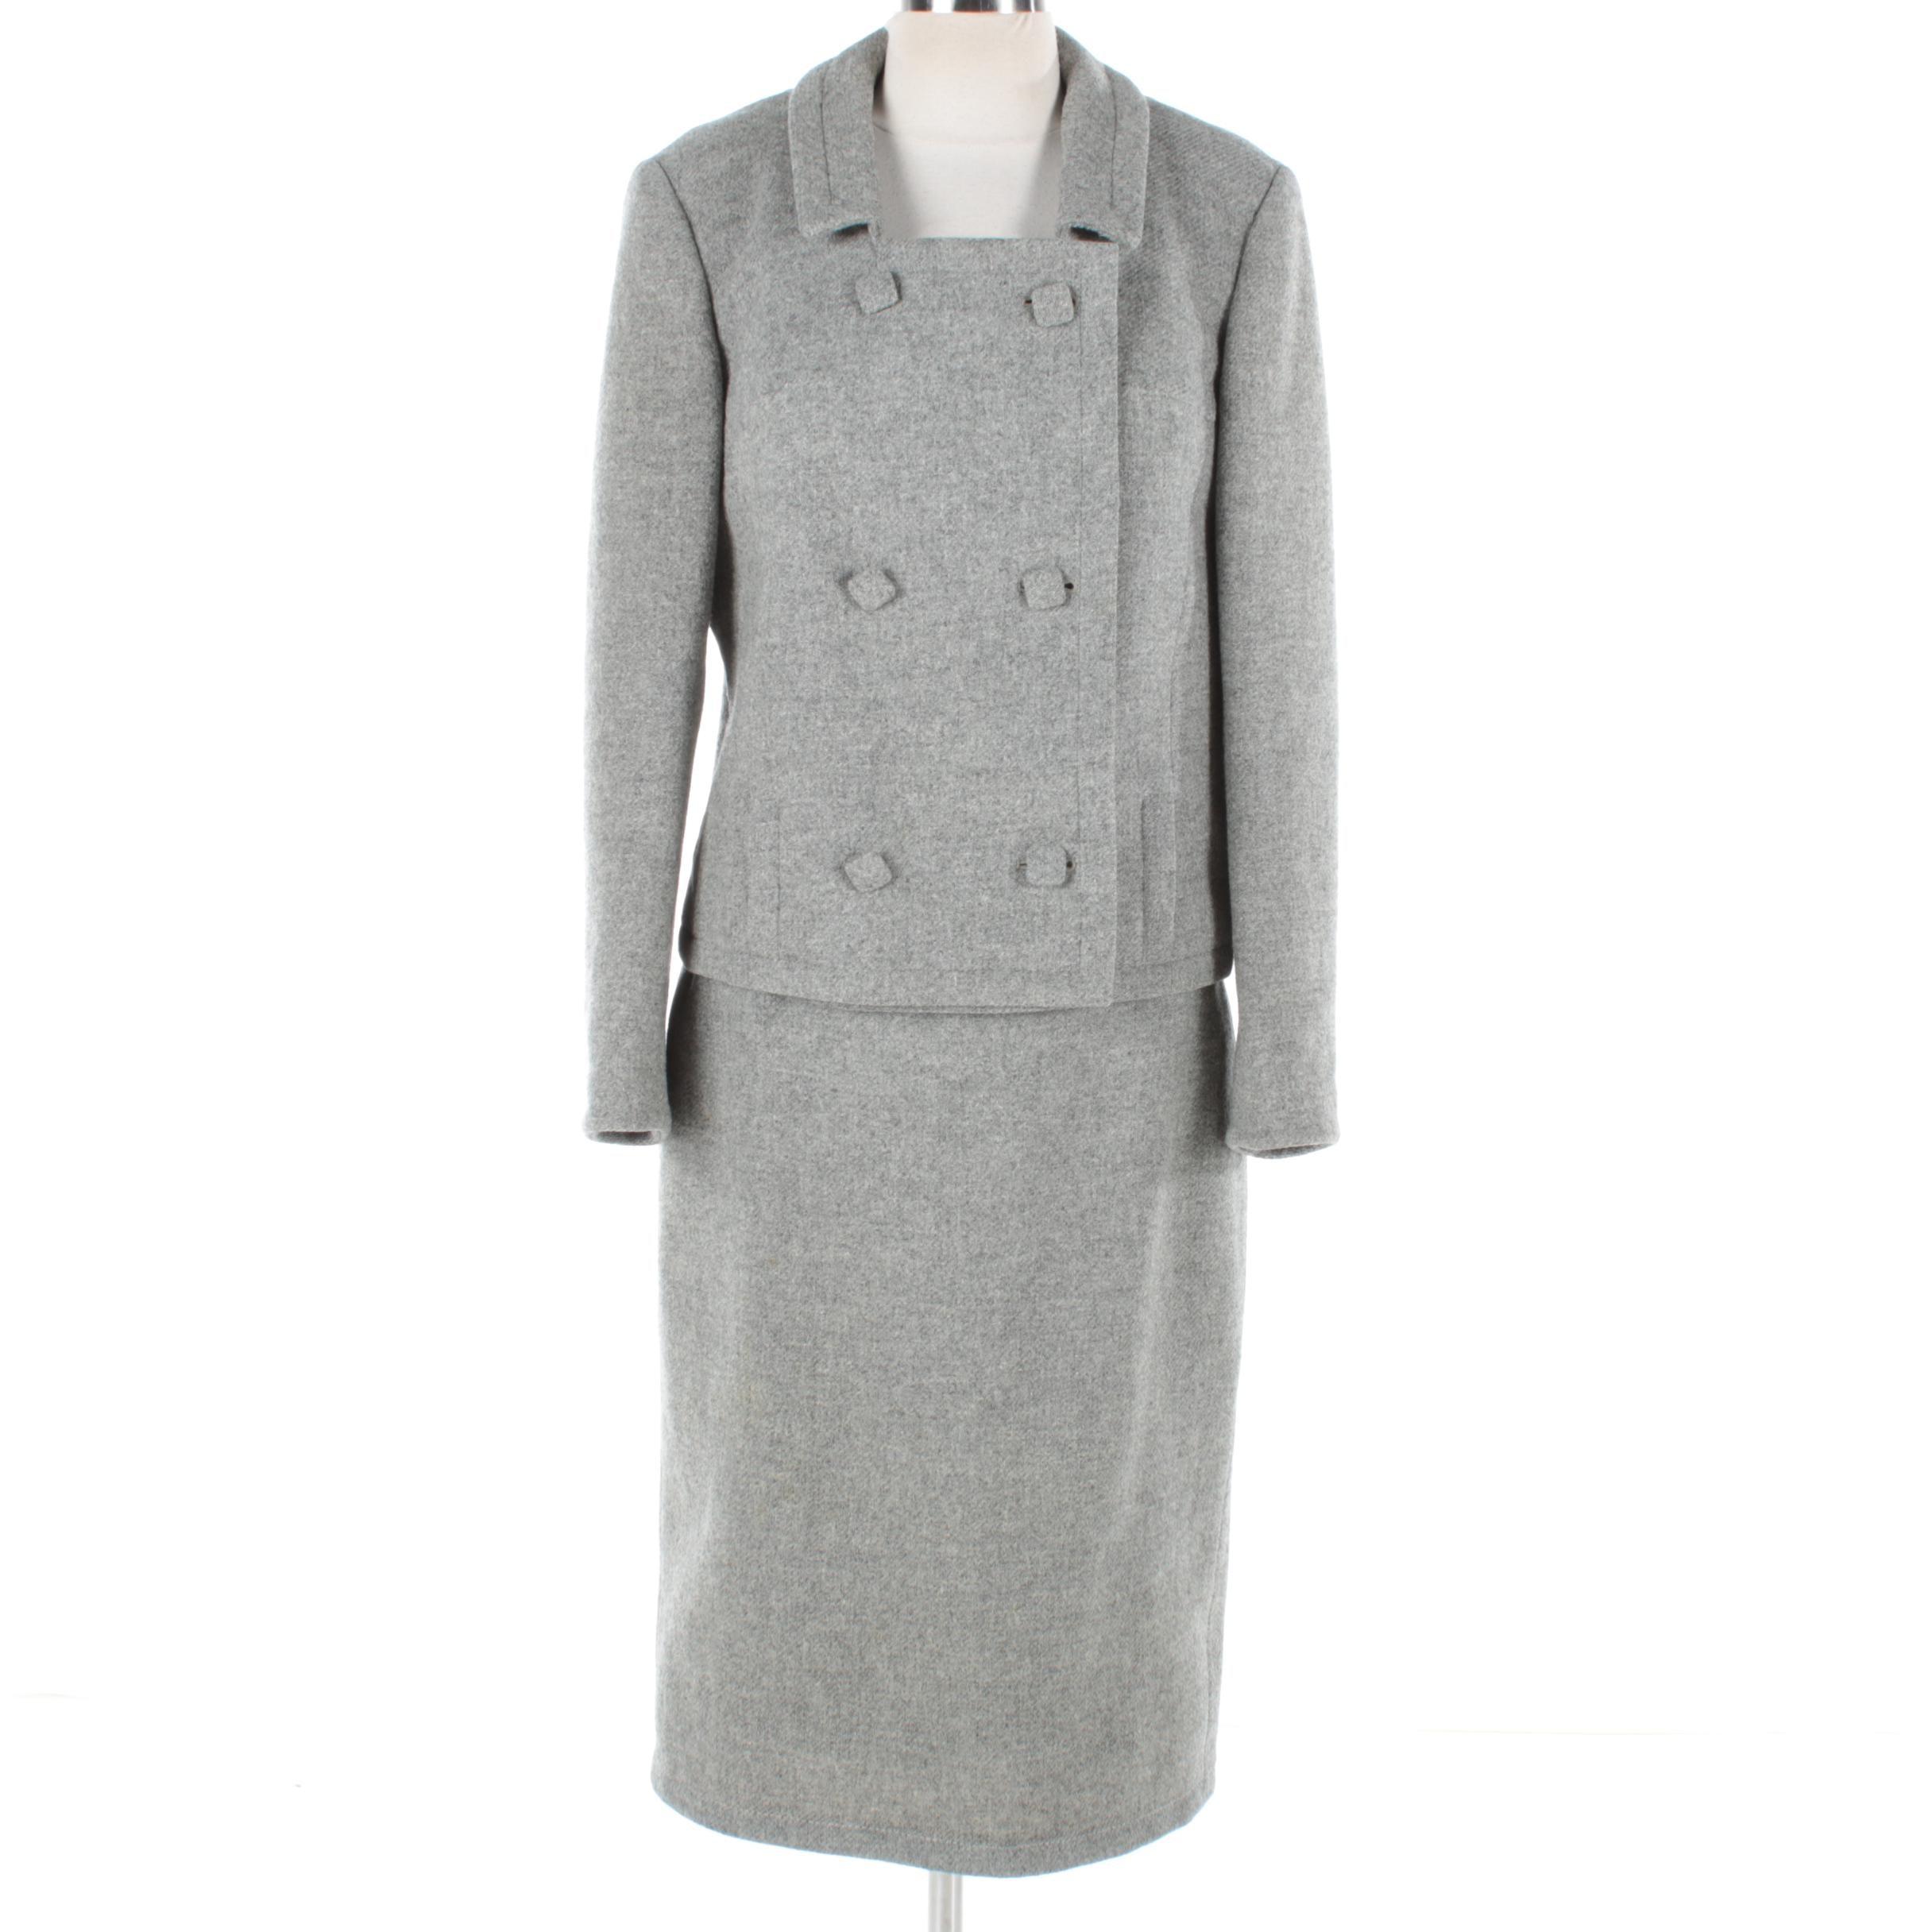 Circa 1960s Vintage Skirt Suit by Highbrow Avantgarde